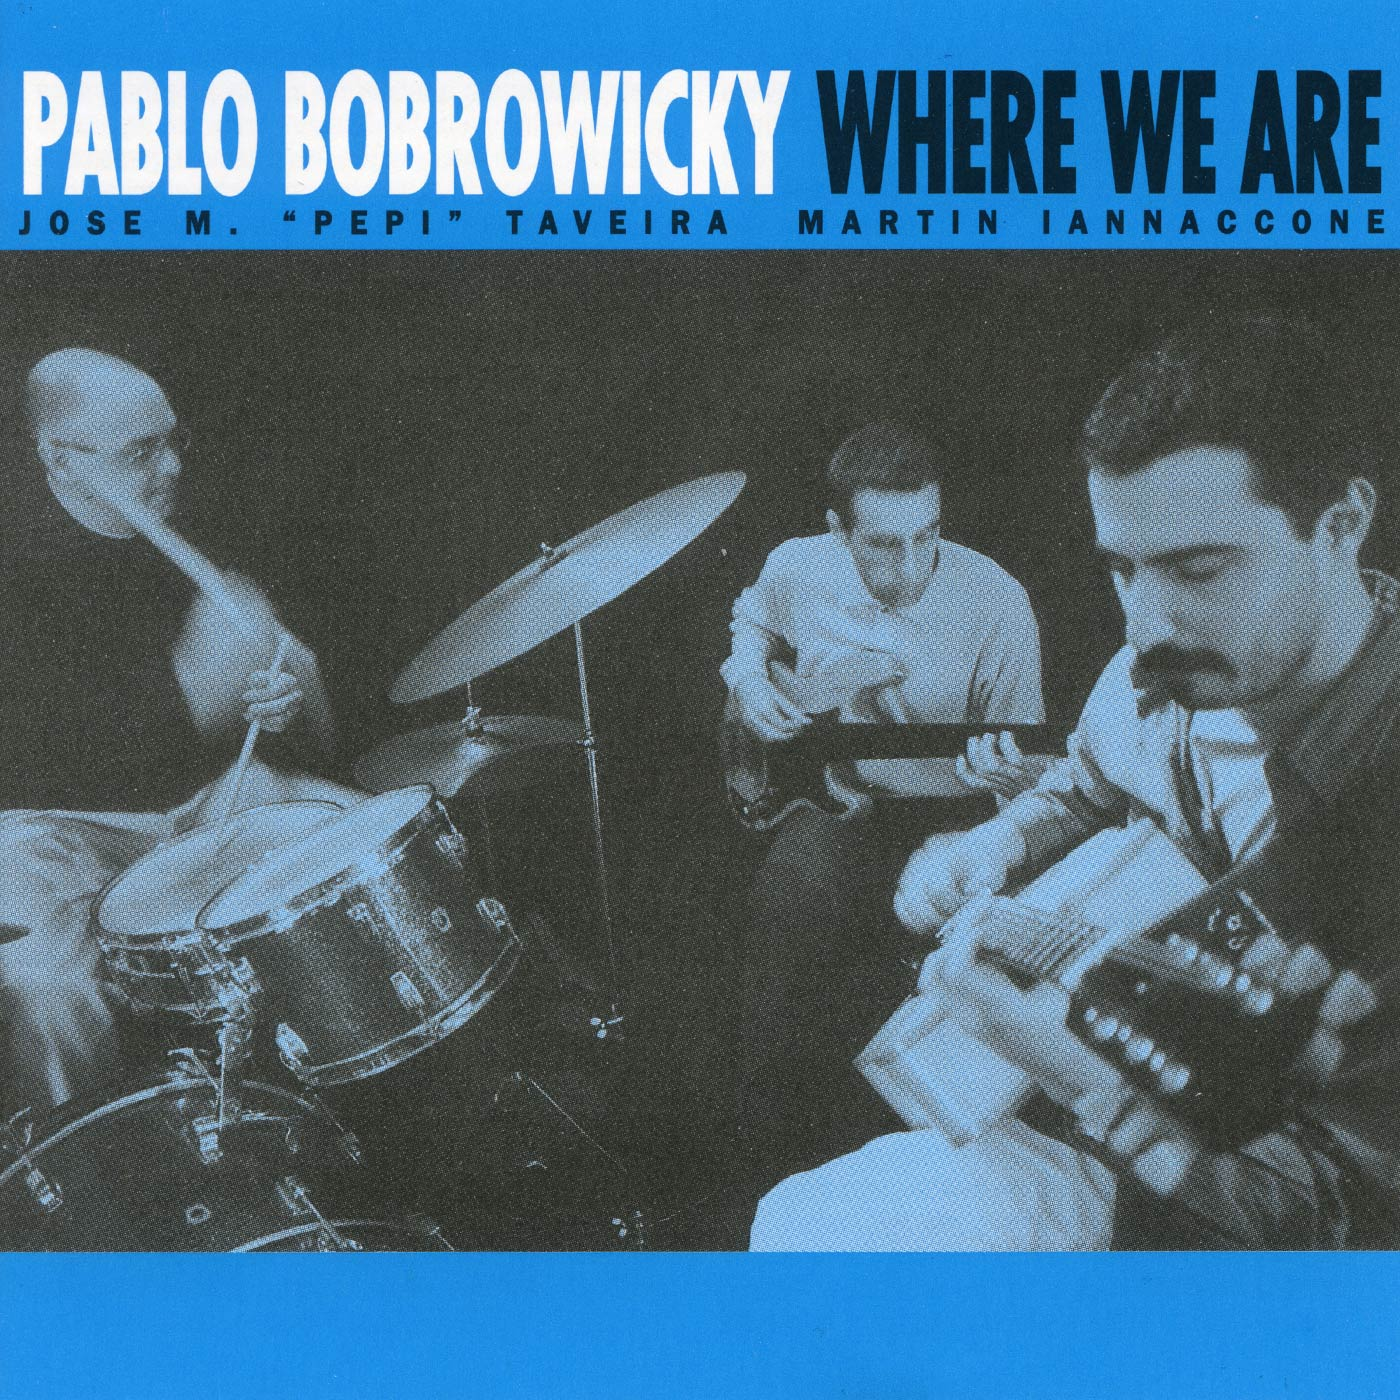 Where We Are - Pablo Bobrowicky